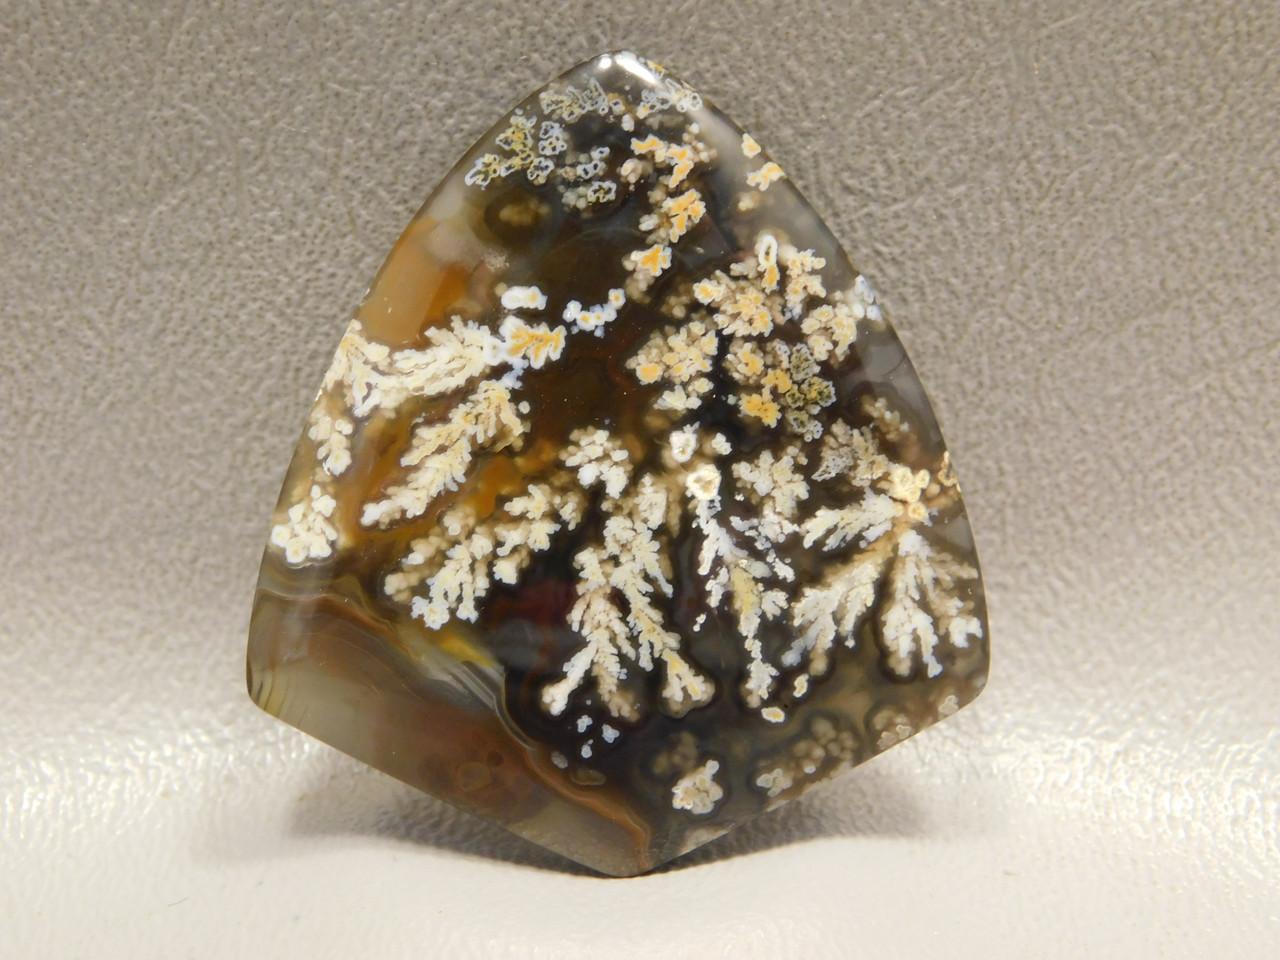 Cabochons Priday Plume Agate Oregon Freeform Agate #13